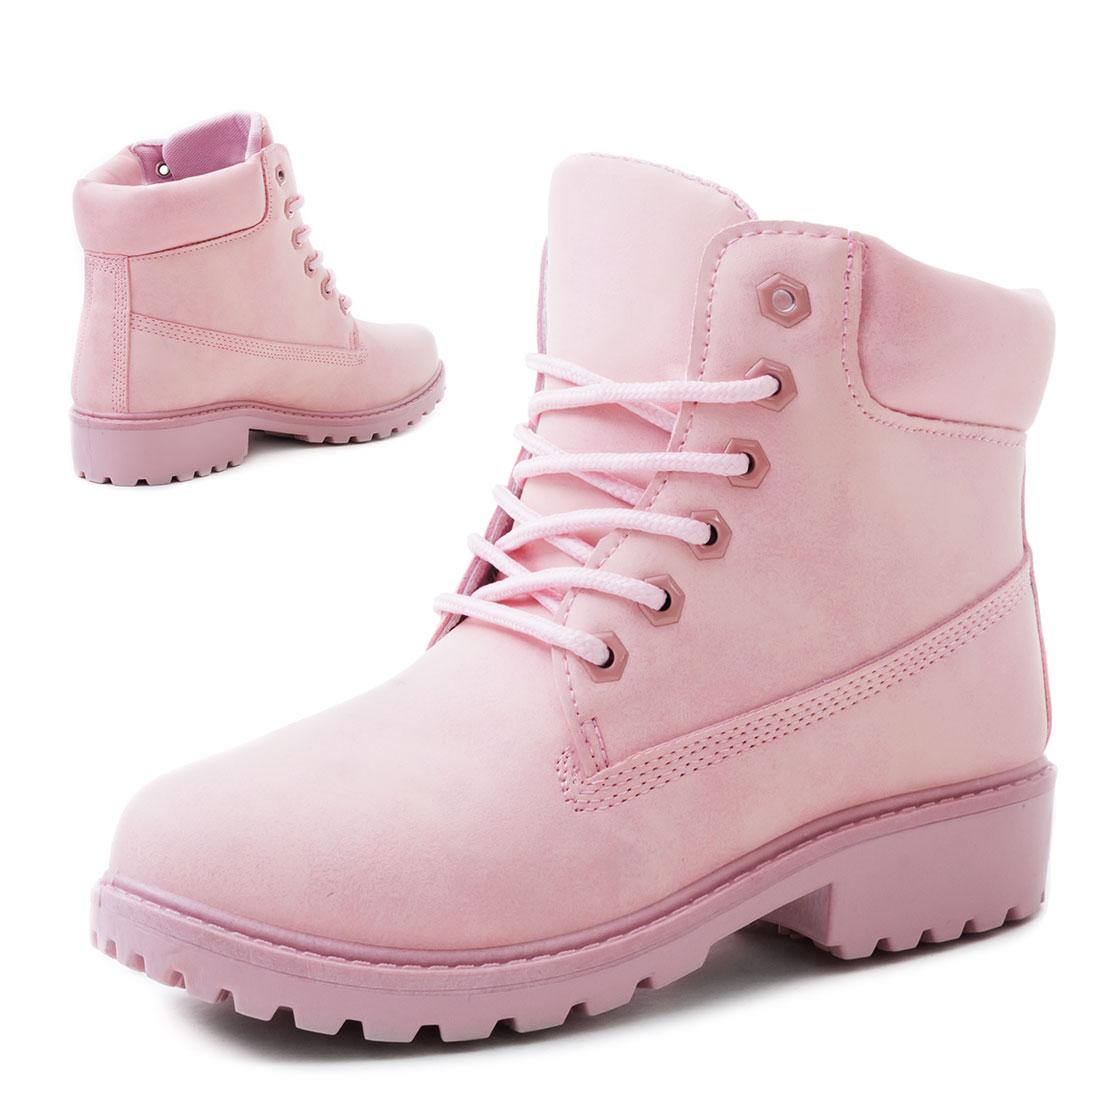 neu damen herbst winter boots outdoor stiefeletten stiefel. Black Bedroom Furniture Sets. Home Design Ideas